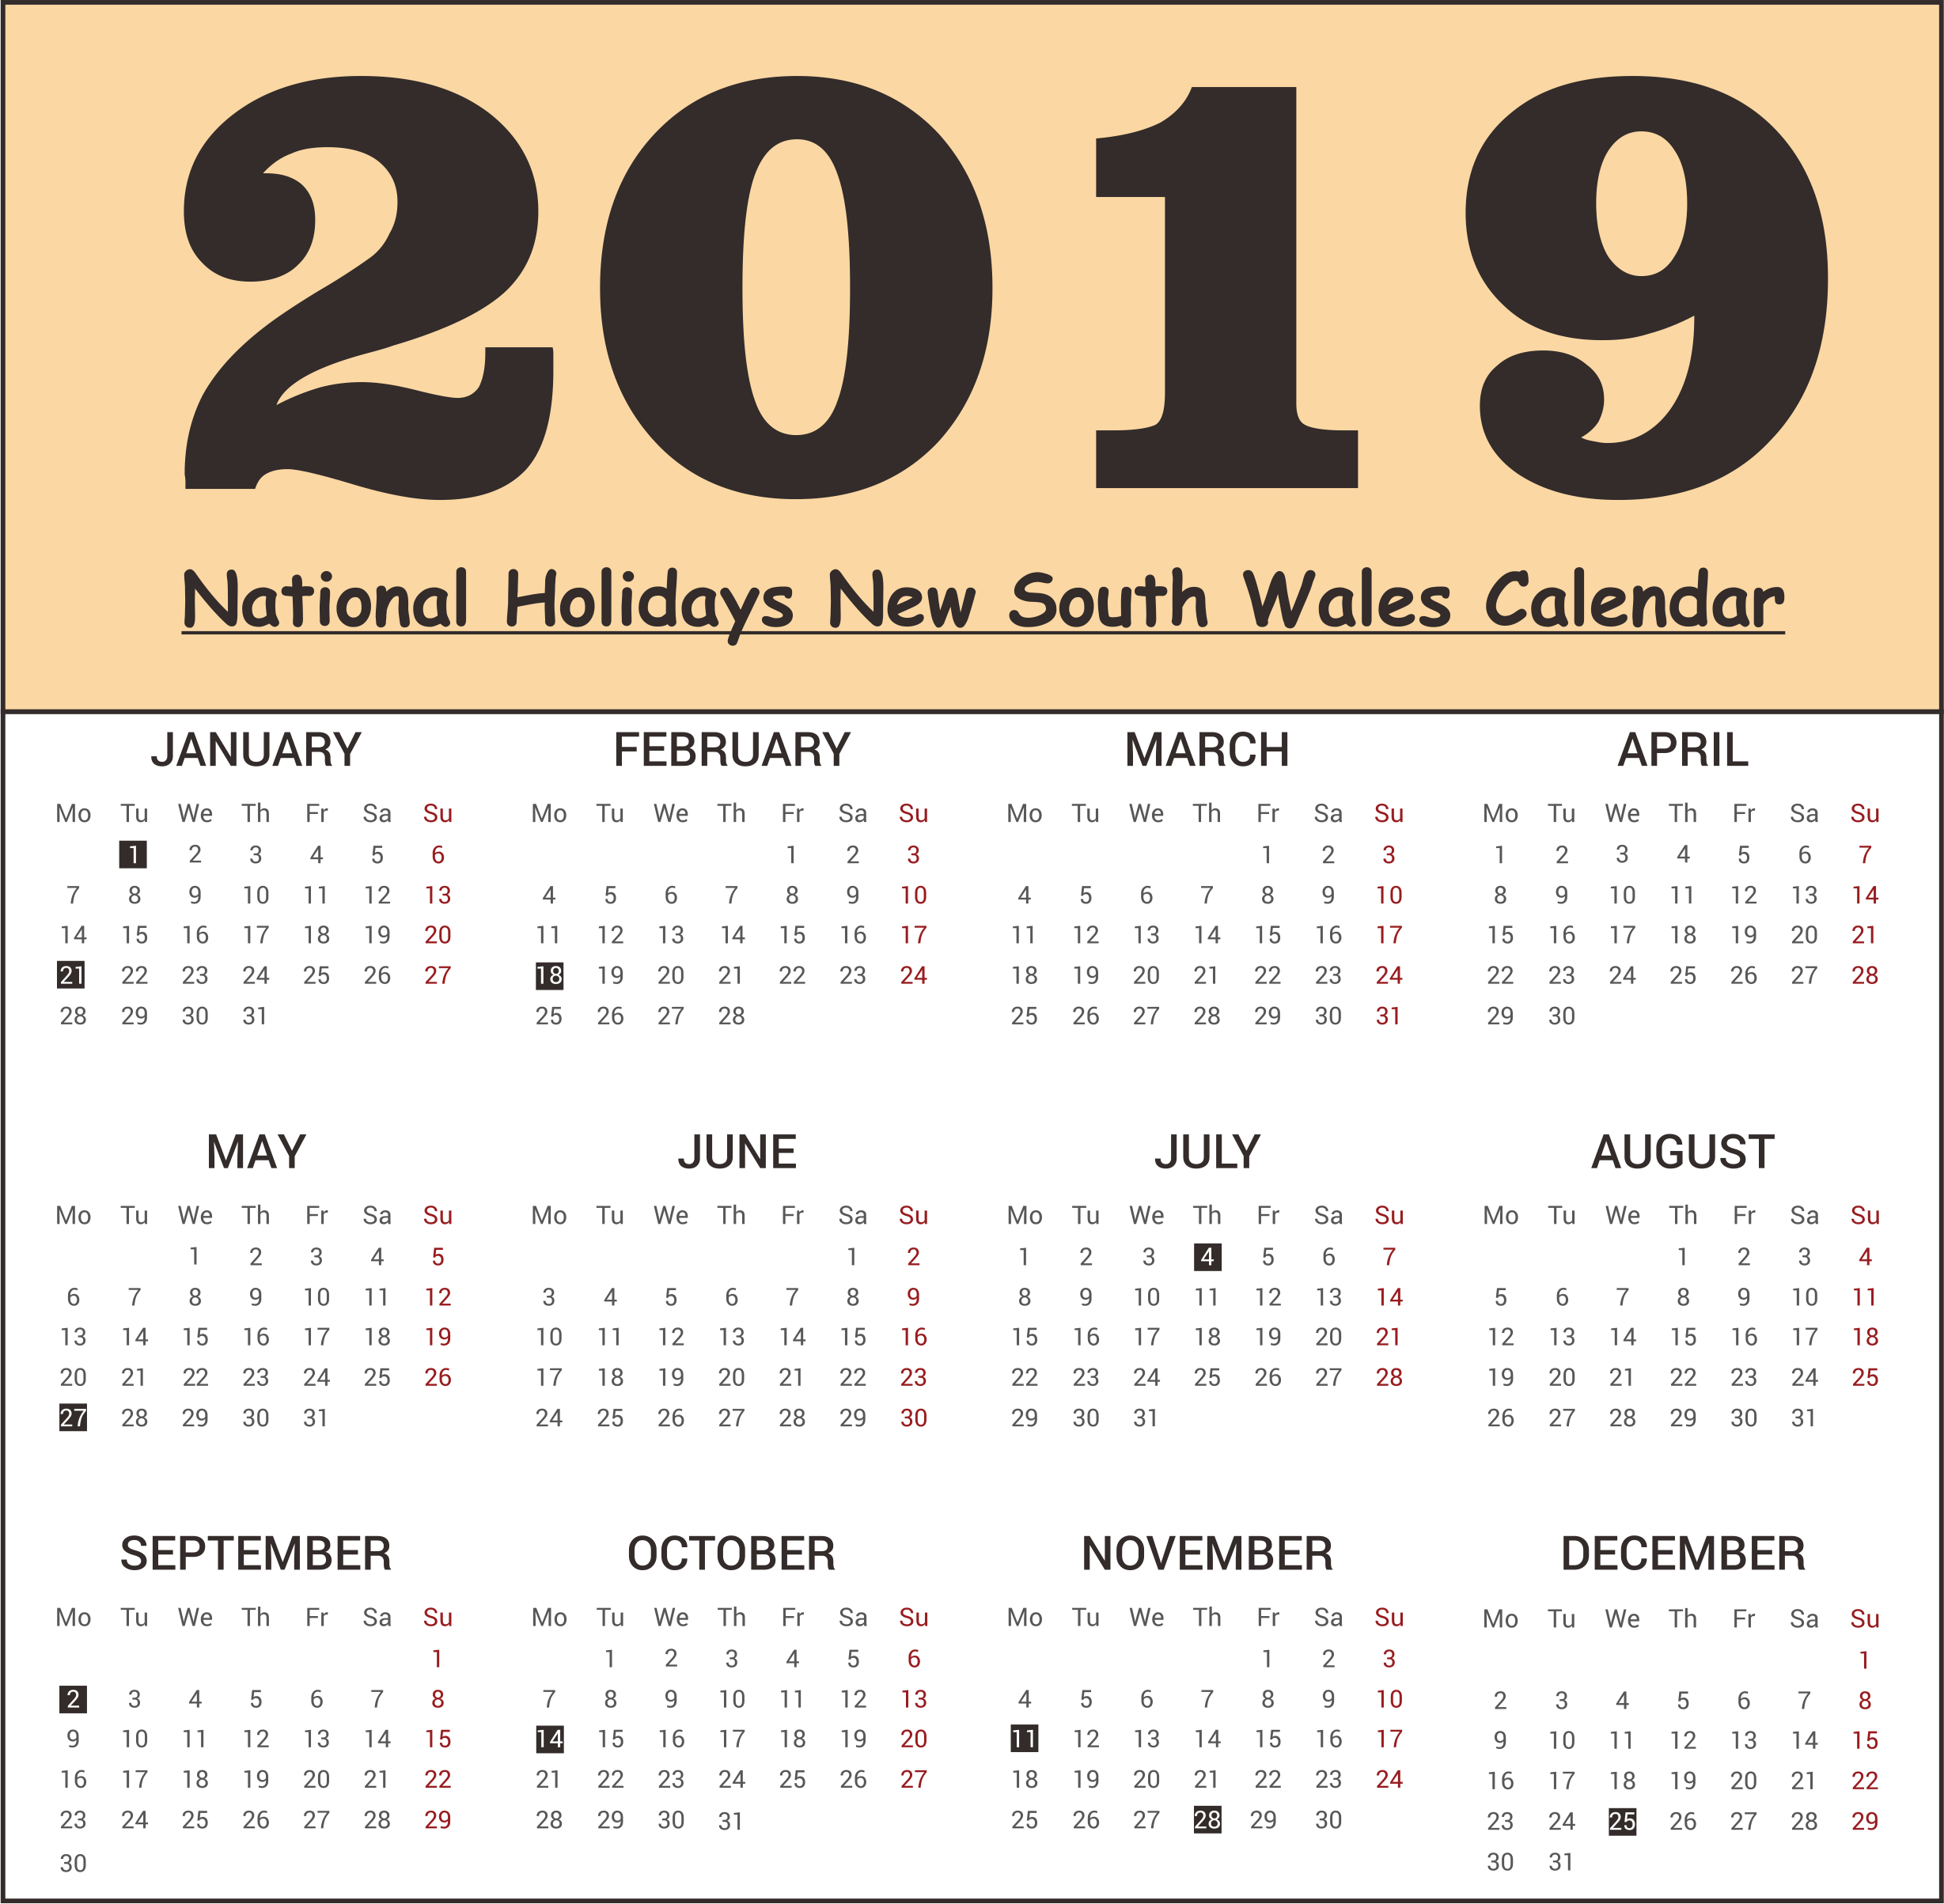 NSW National Holidays 2019 Templates